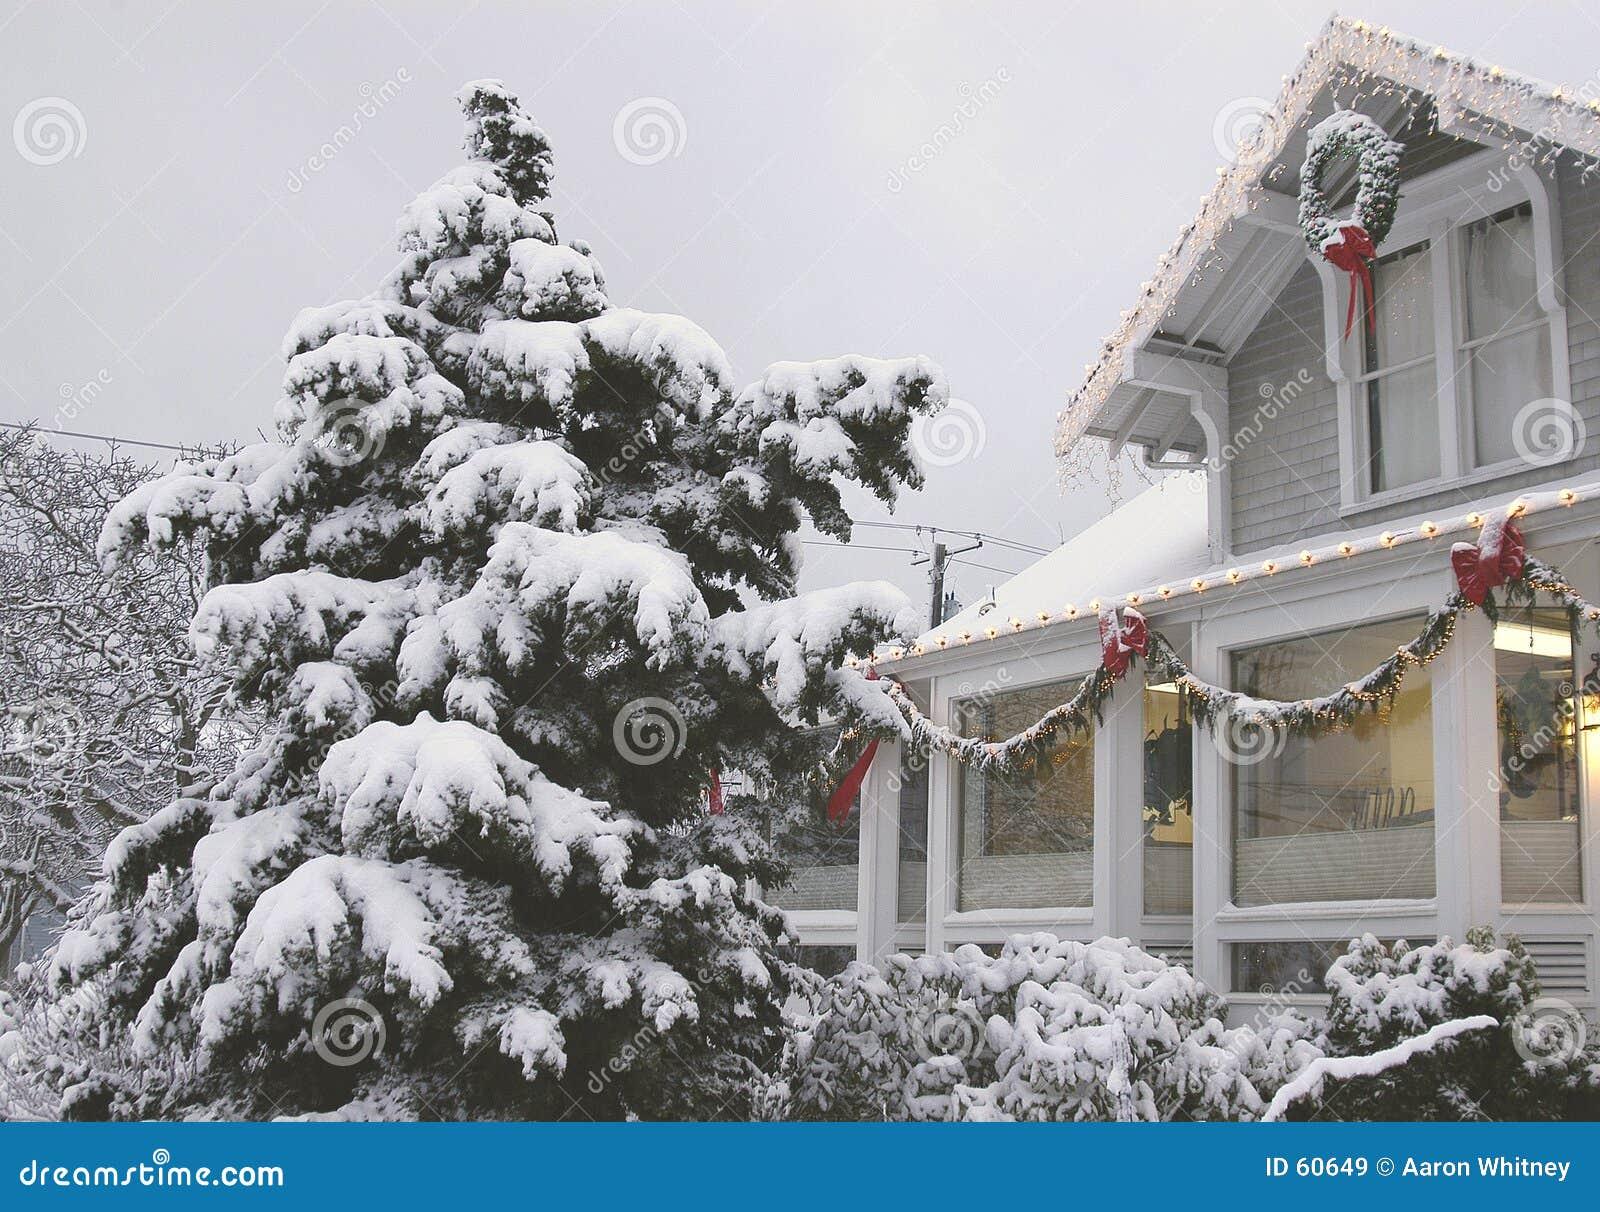 办公室冬天